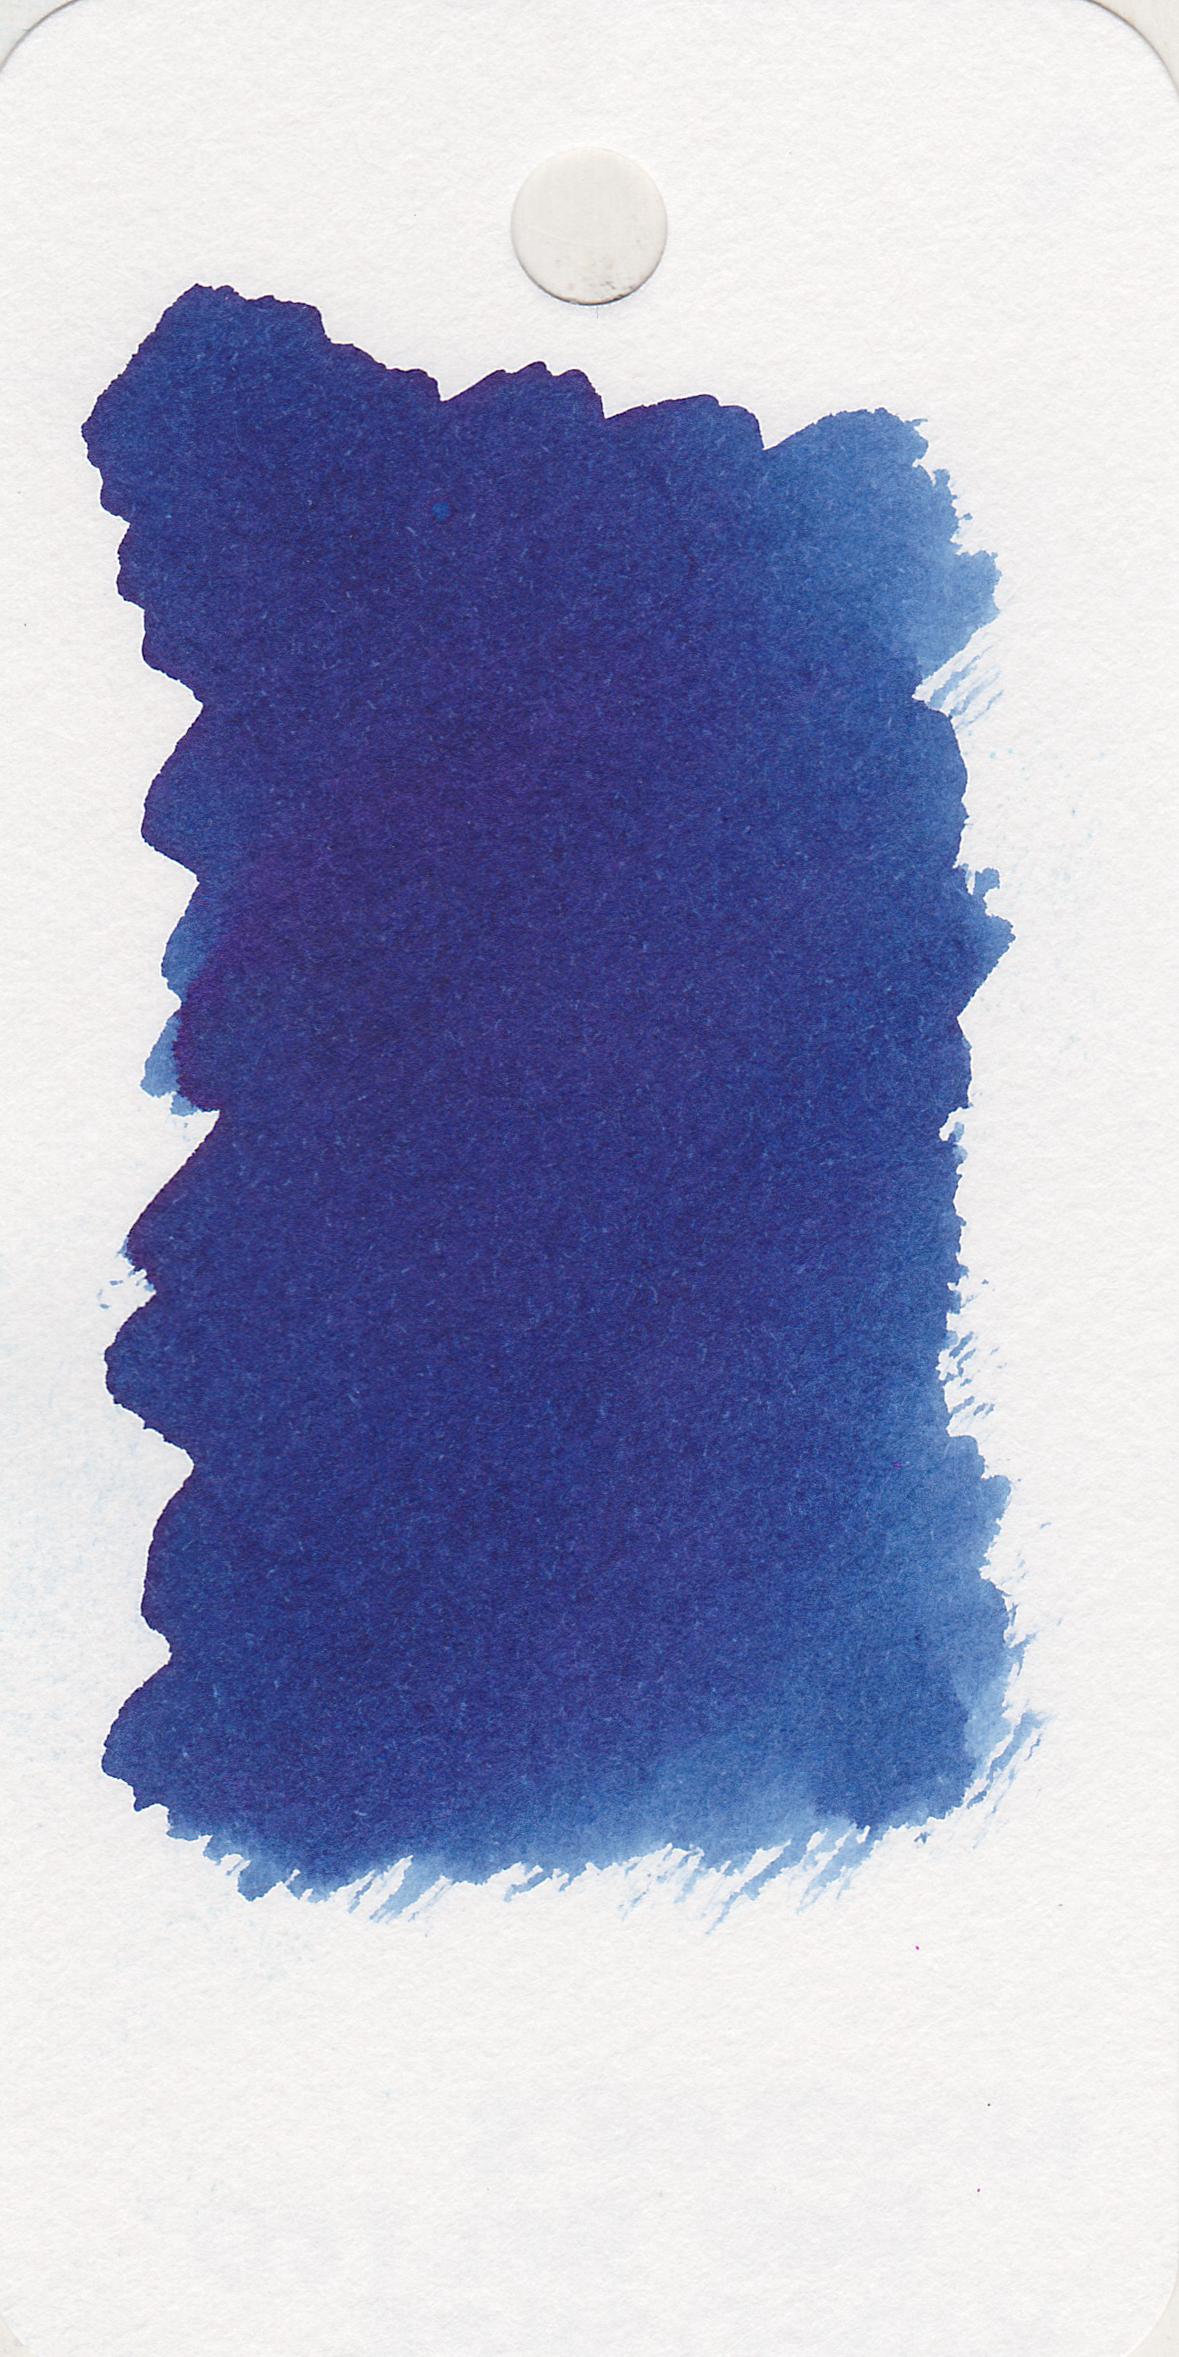 cv-saturn-v-3.jpg